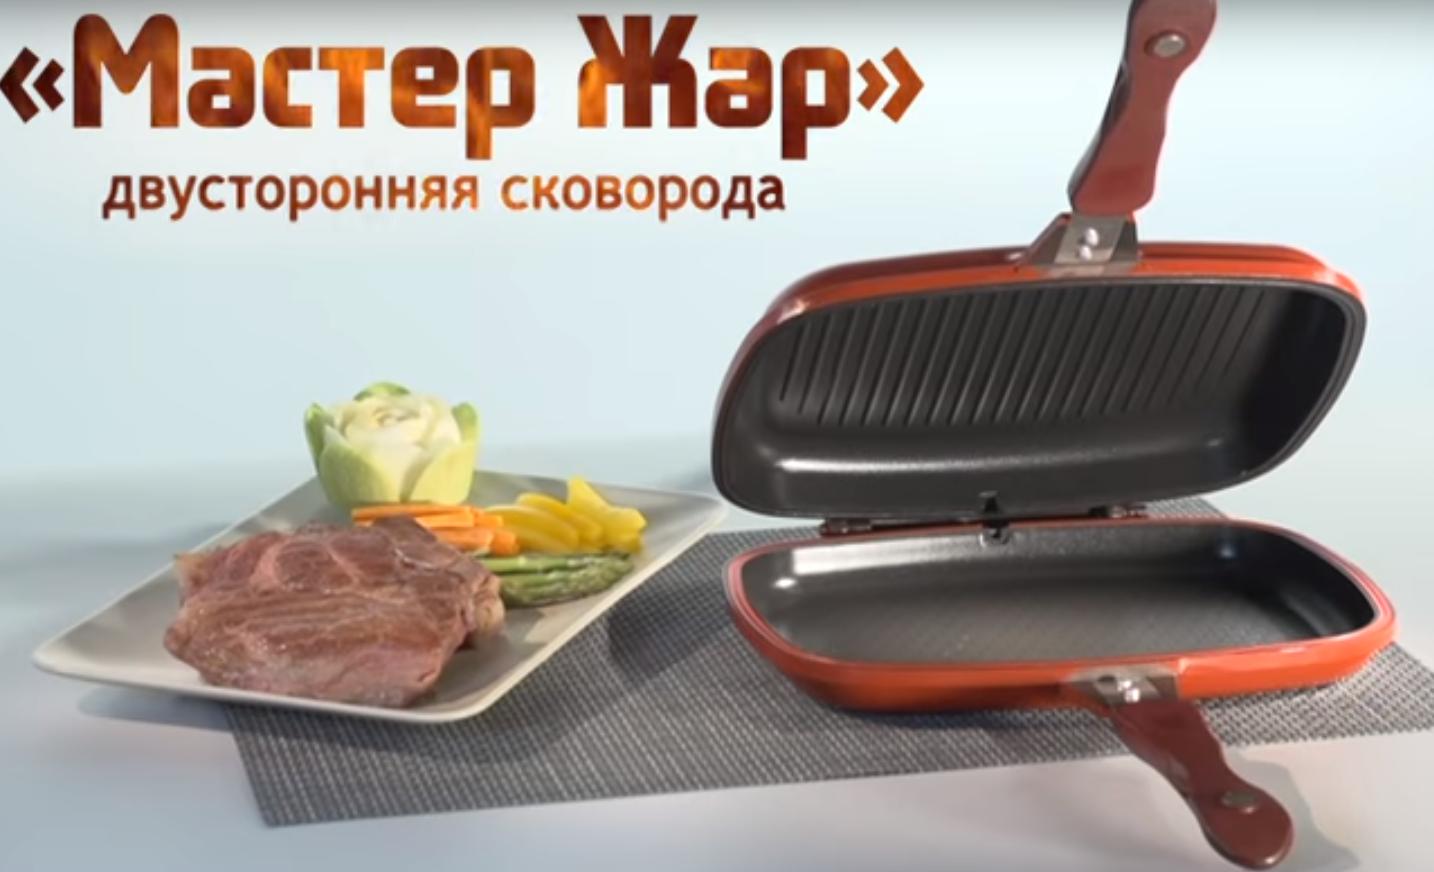 двухсторонняя сковорода мастер жар